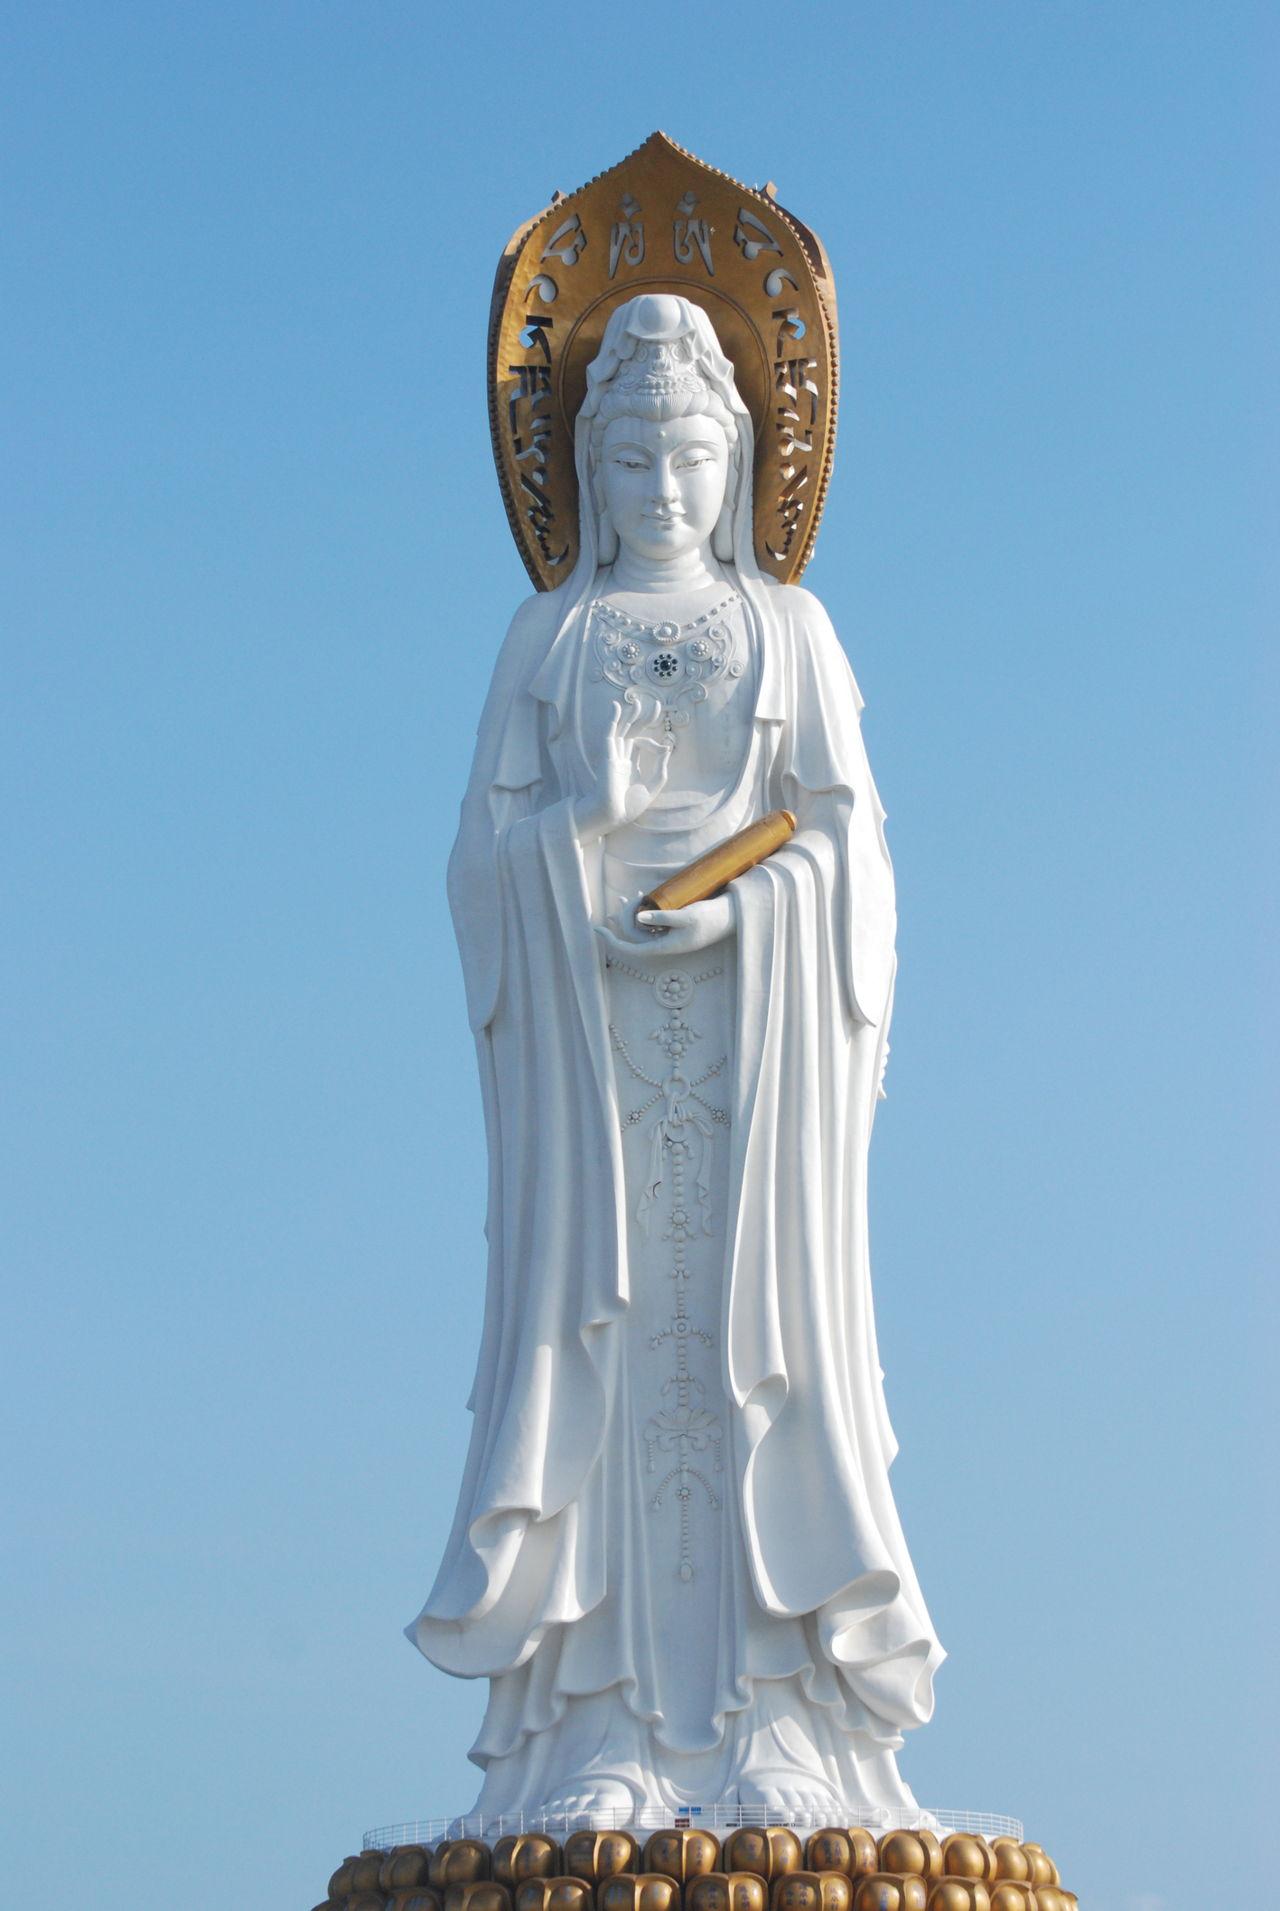 Buddhist mudras kwan in statue biocorpaavc Choice Image